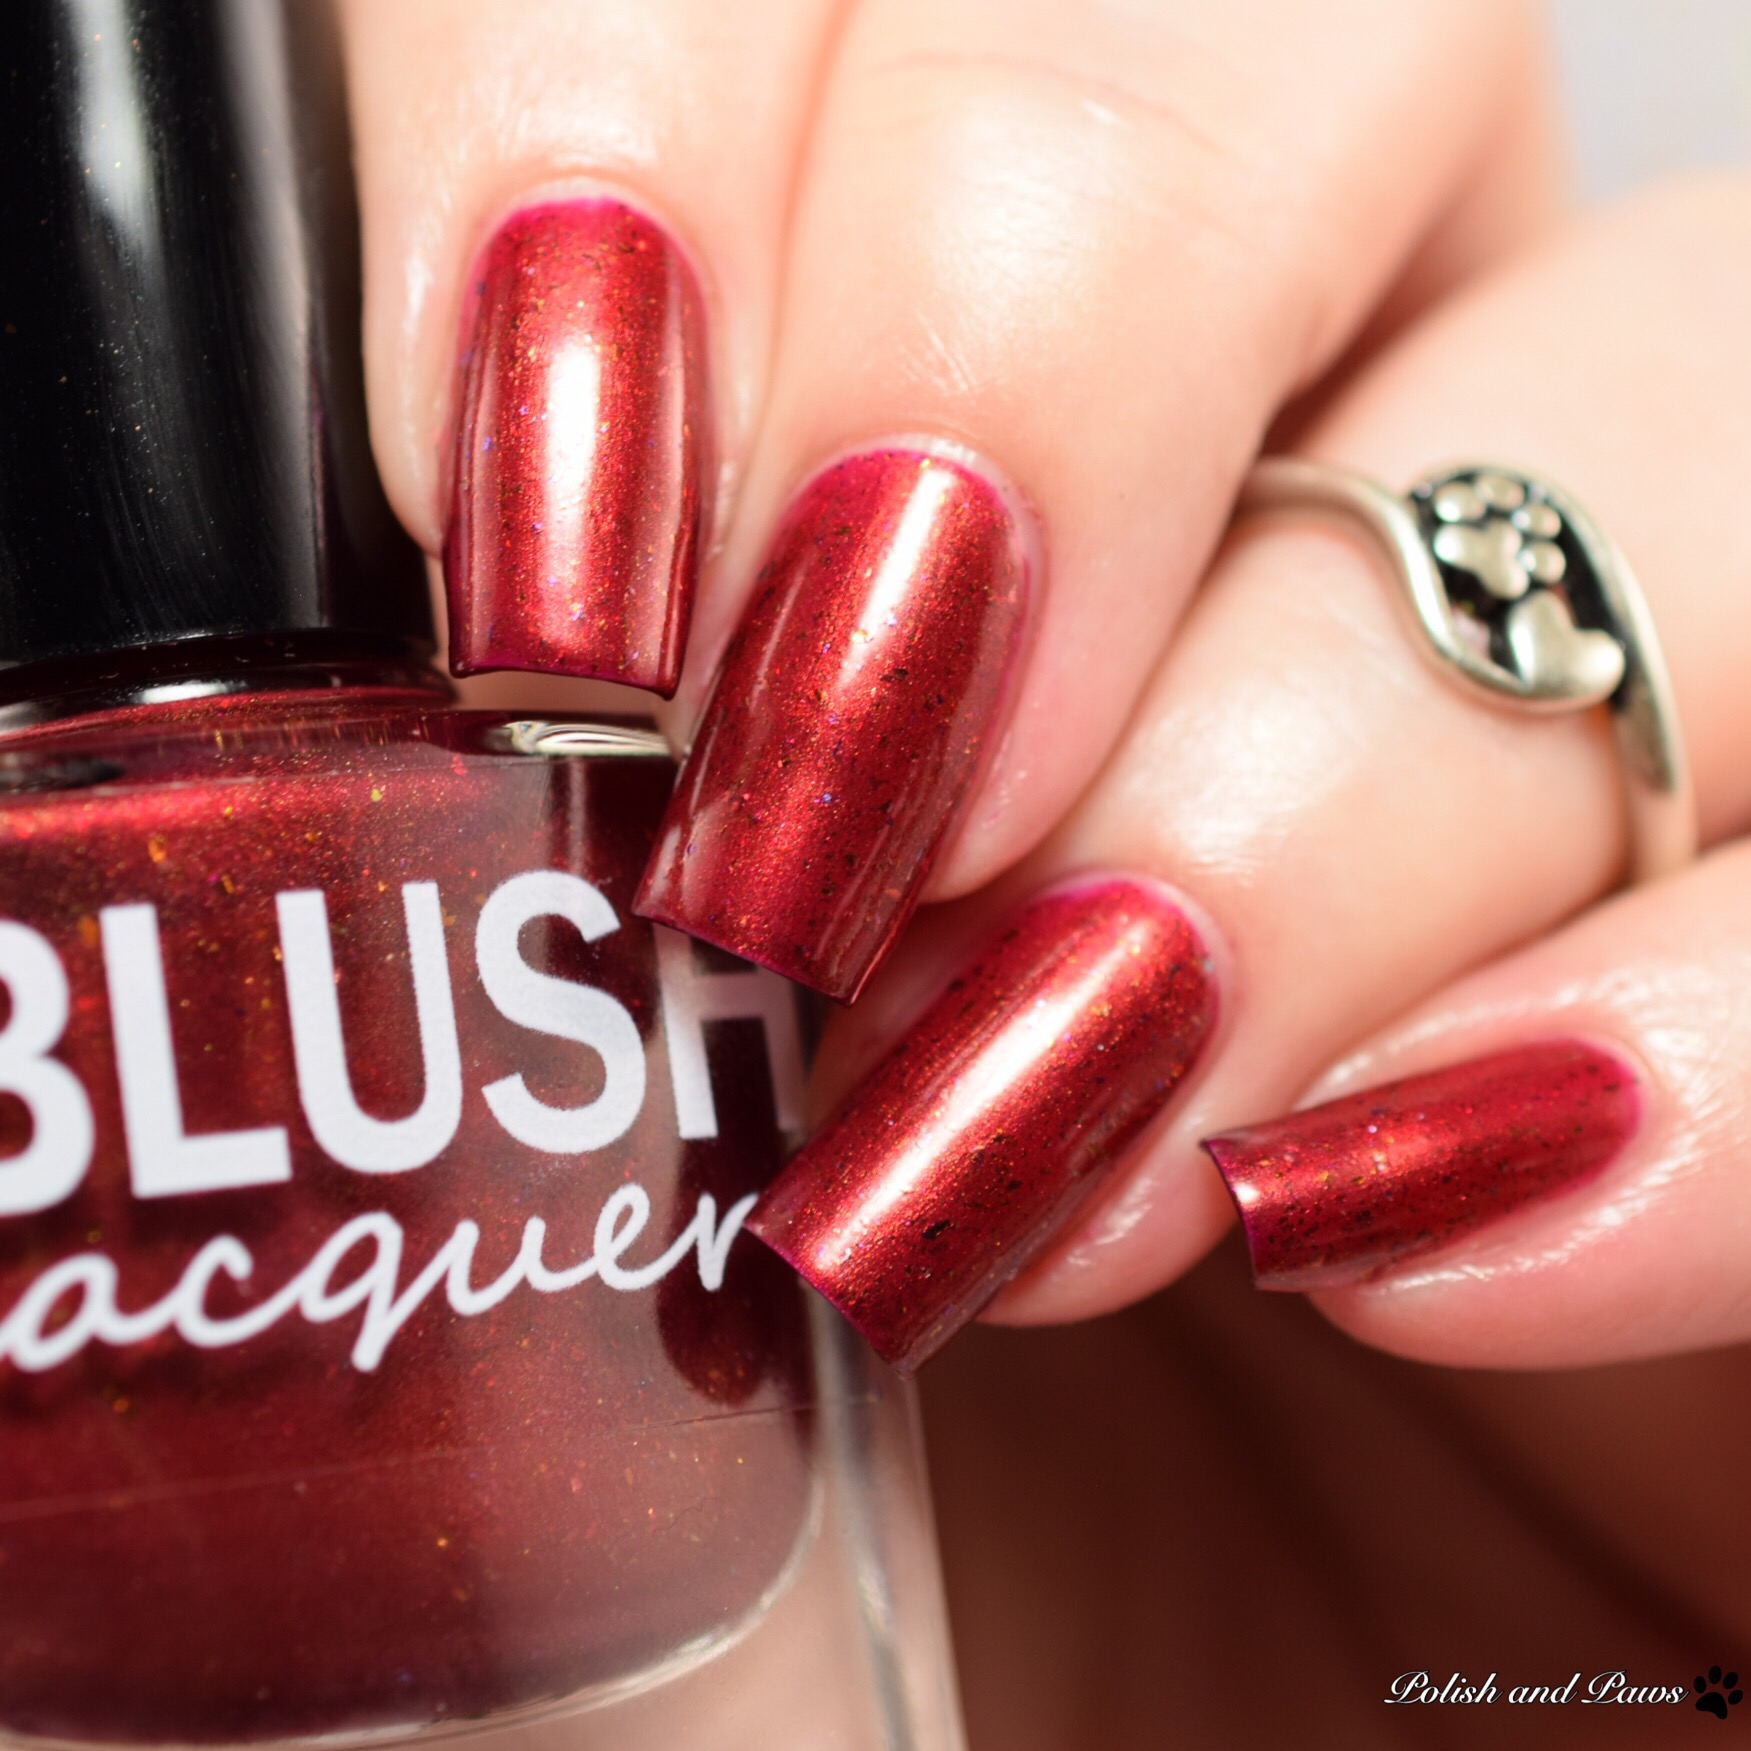 Blush Lacquers Bloodlines